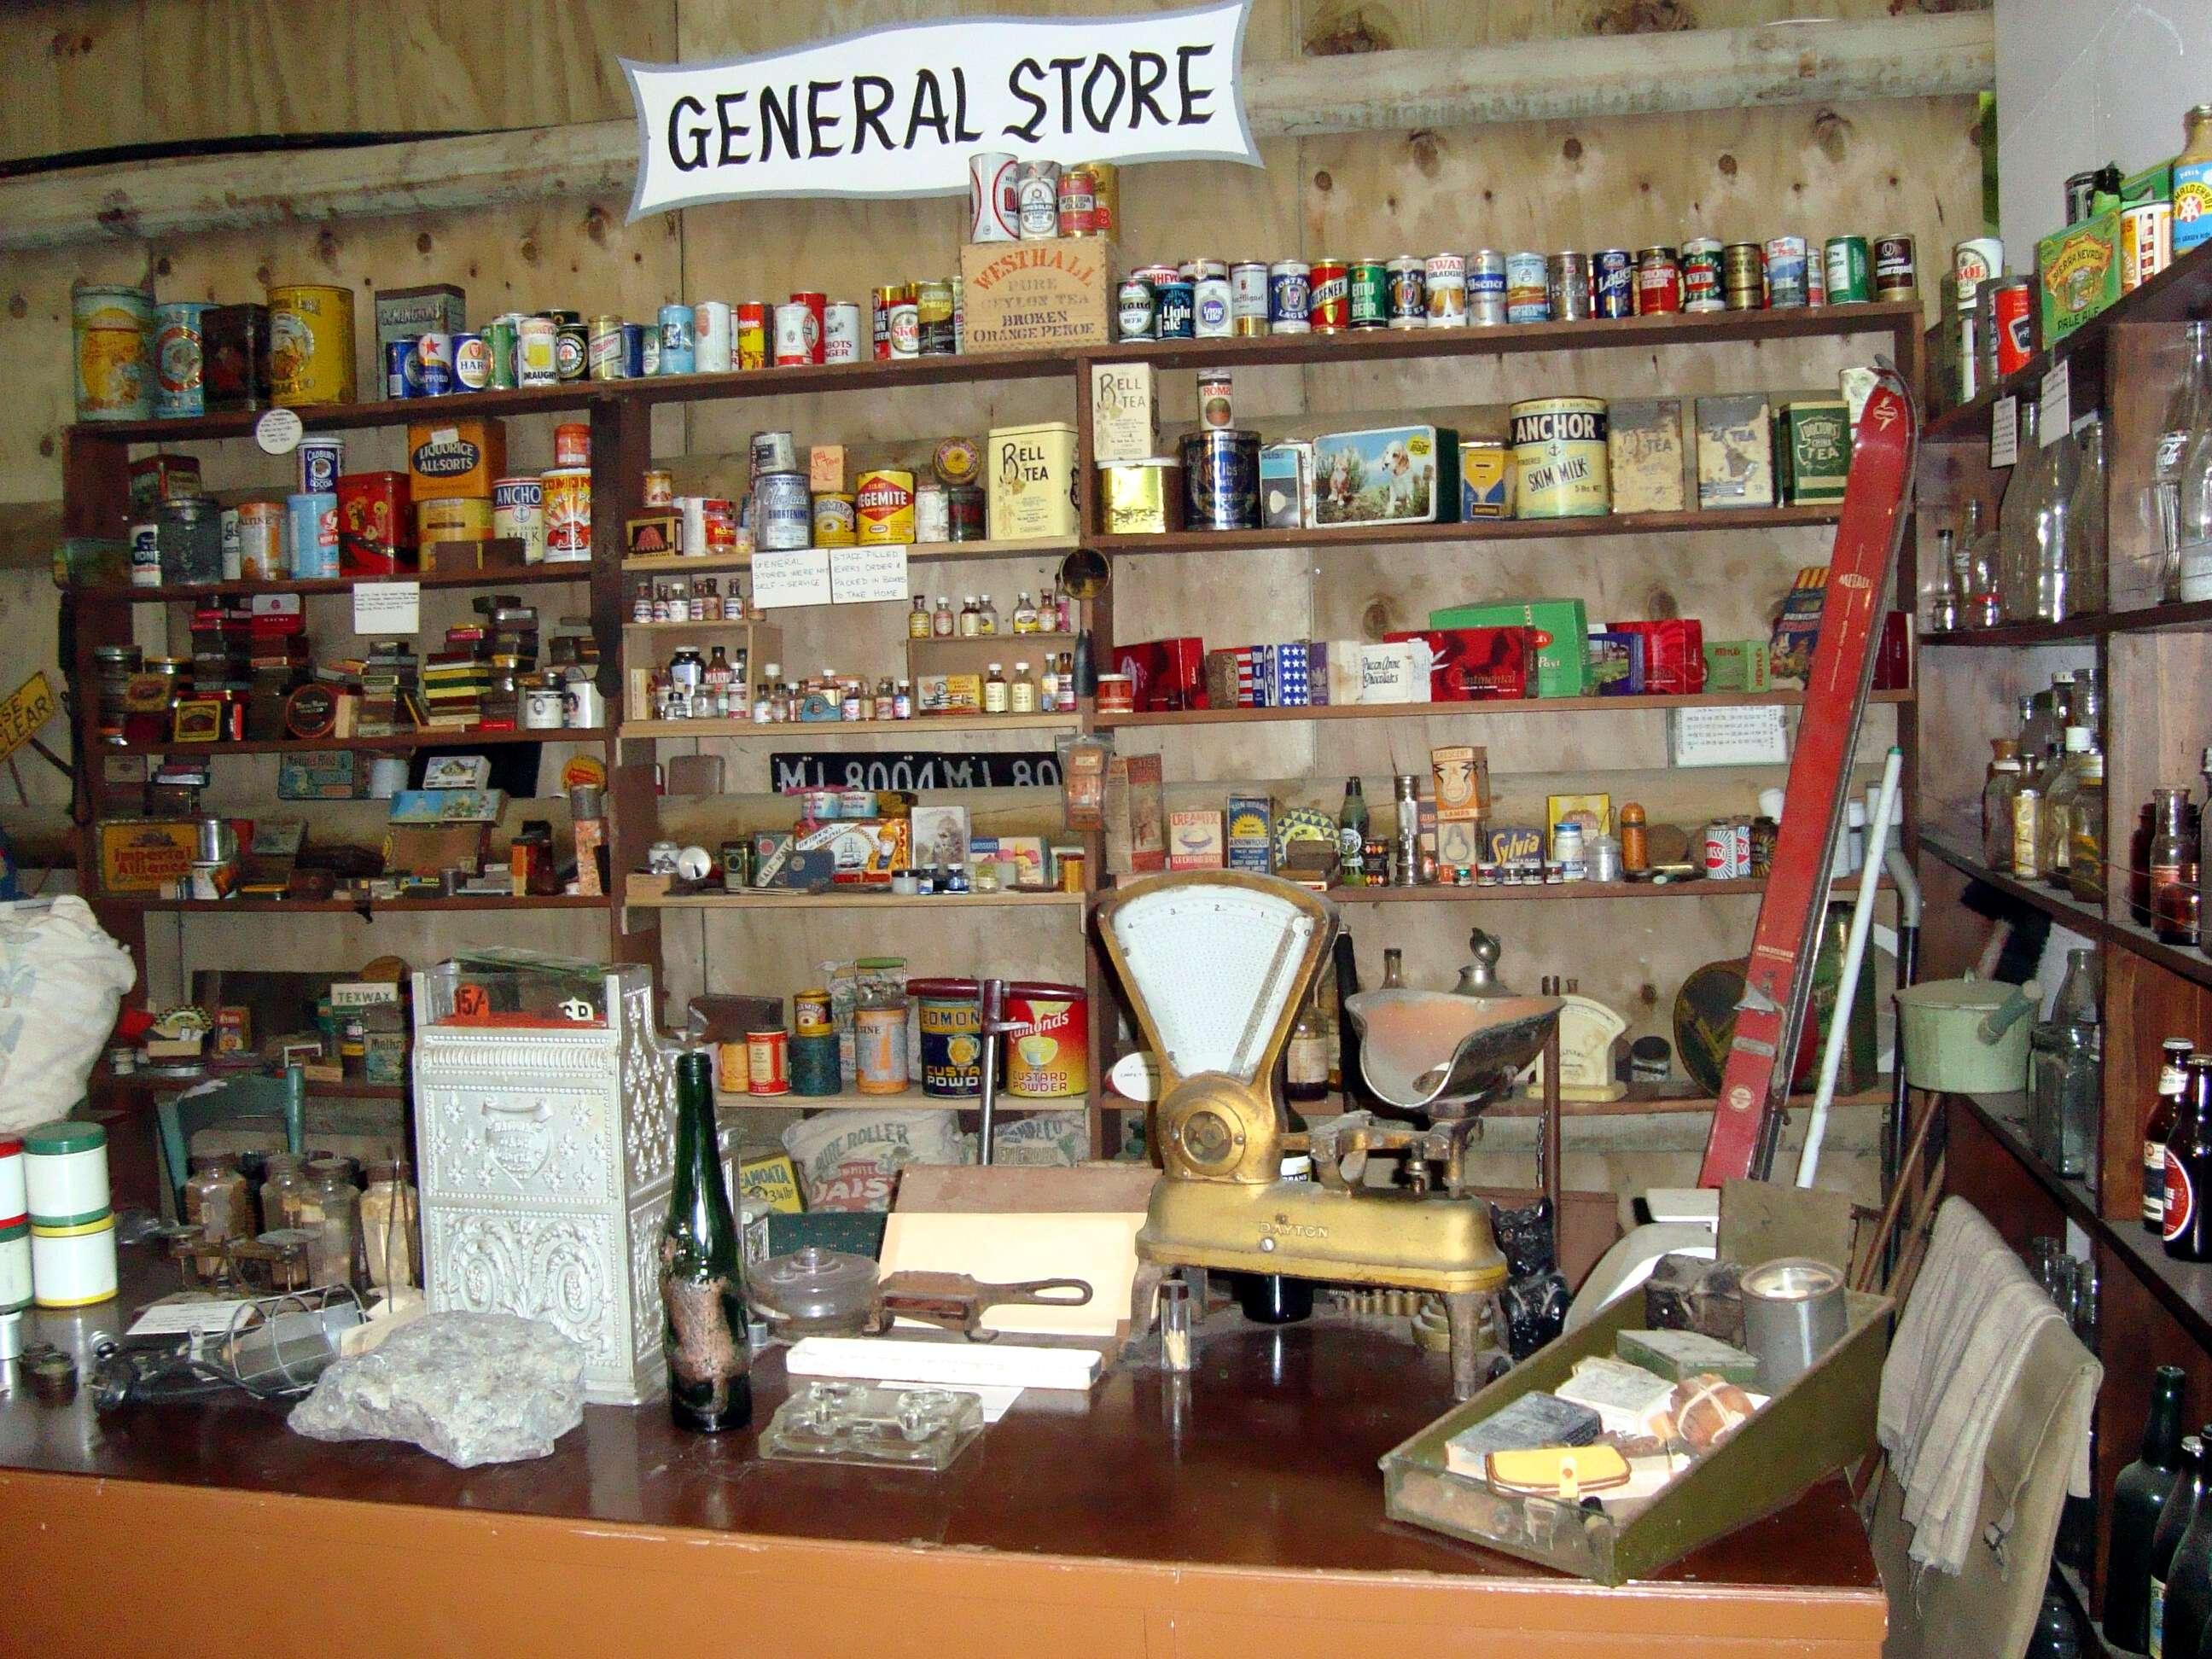 General Store Wallpapers - Wallpaper Cave